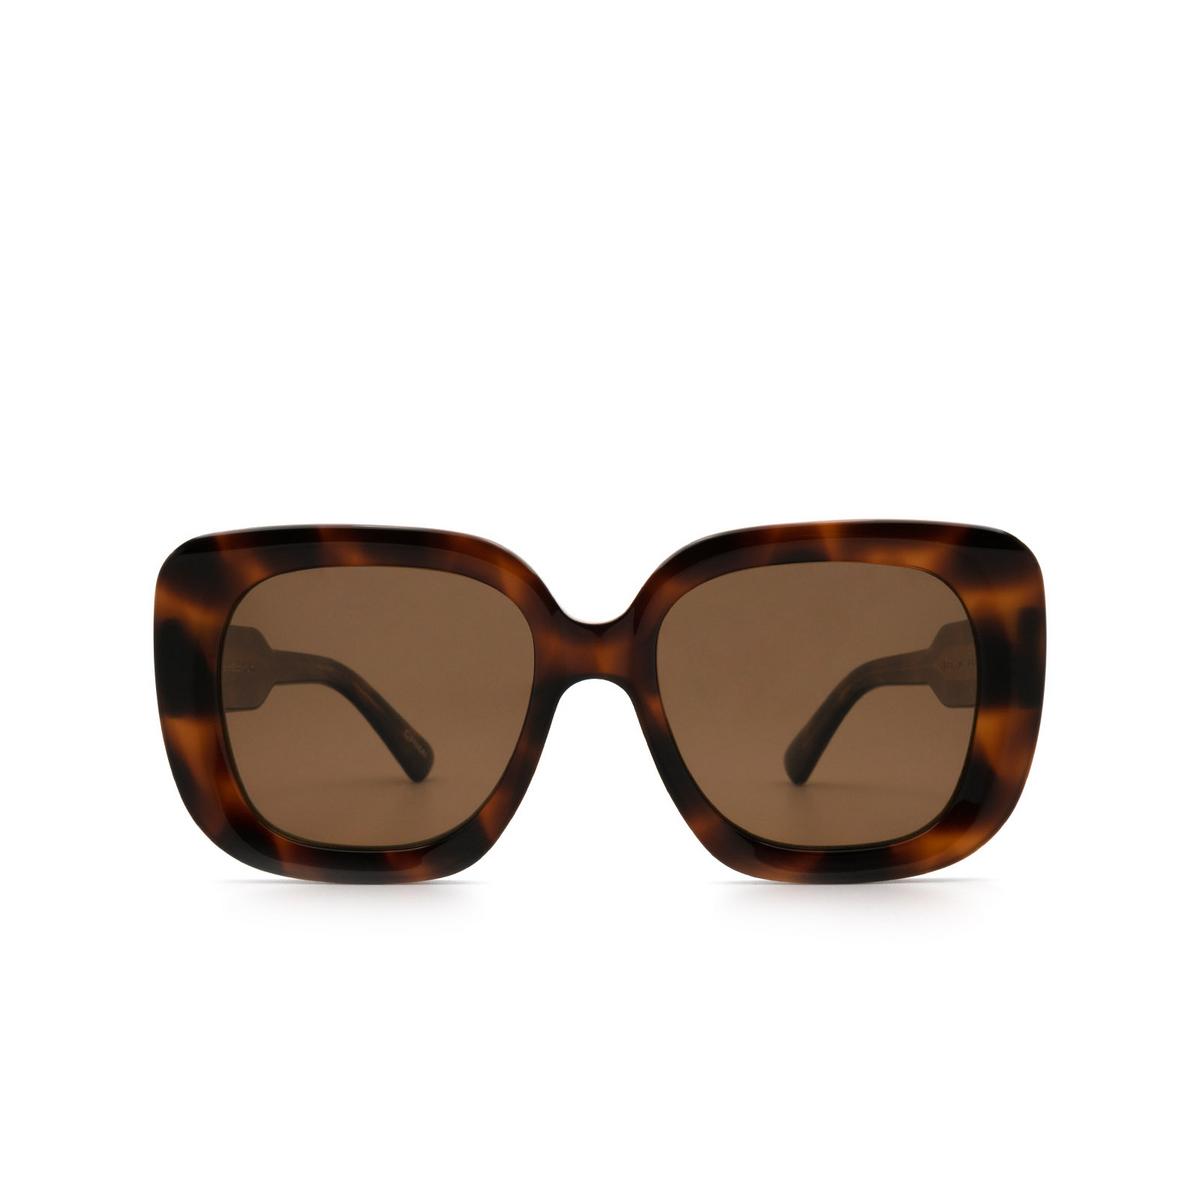 Chimi® Square Sunglasses: 10 color Tortoise - front view.